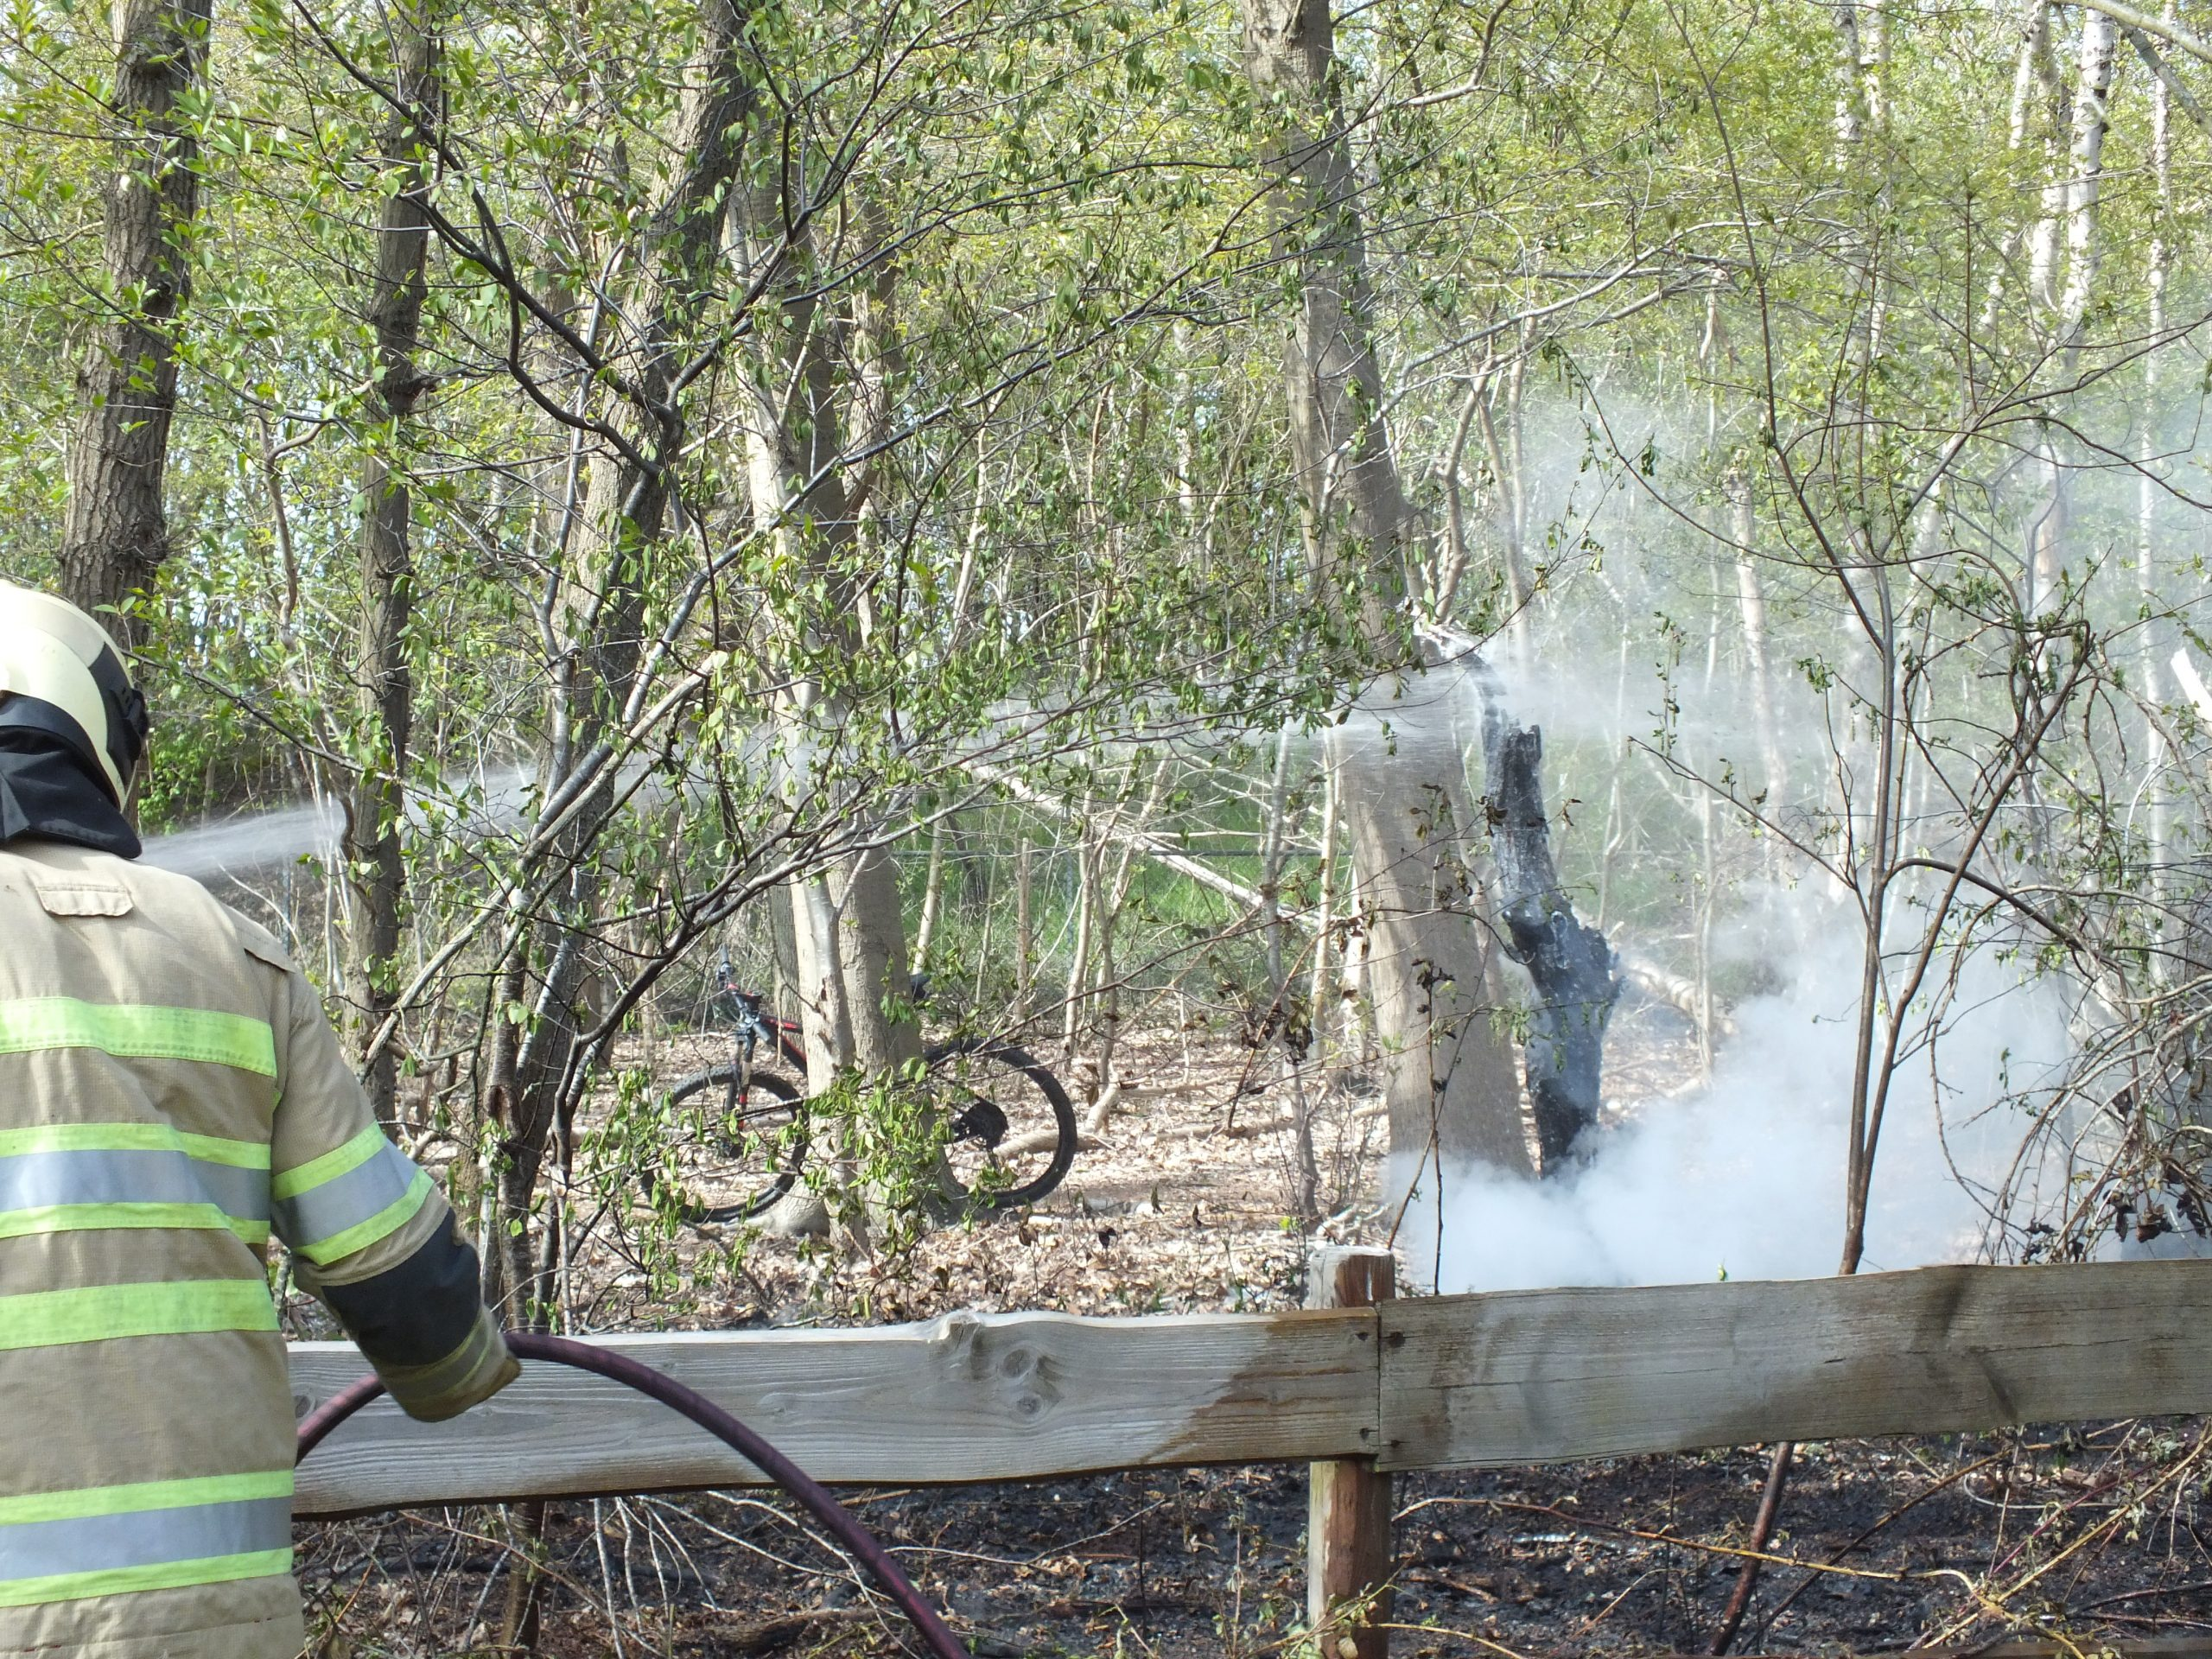 Beginnende bosbrand in de kiem gesmoord